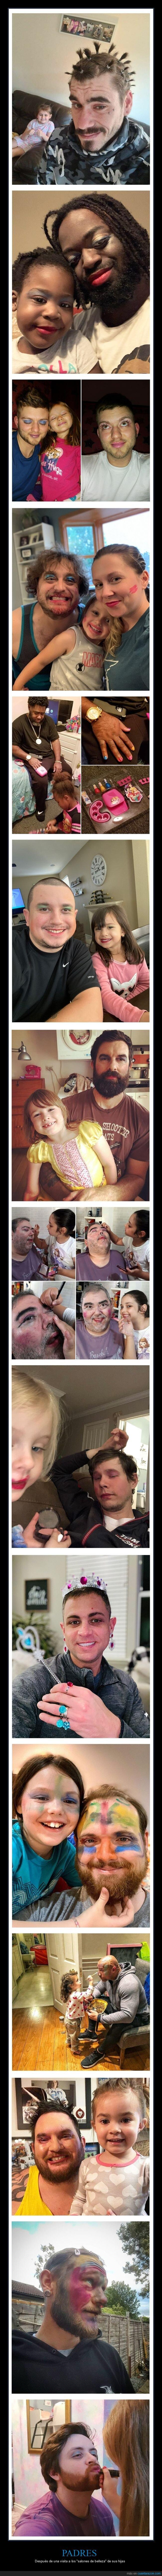 hijas,maquillaje,padres